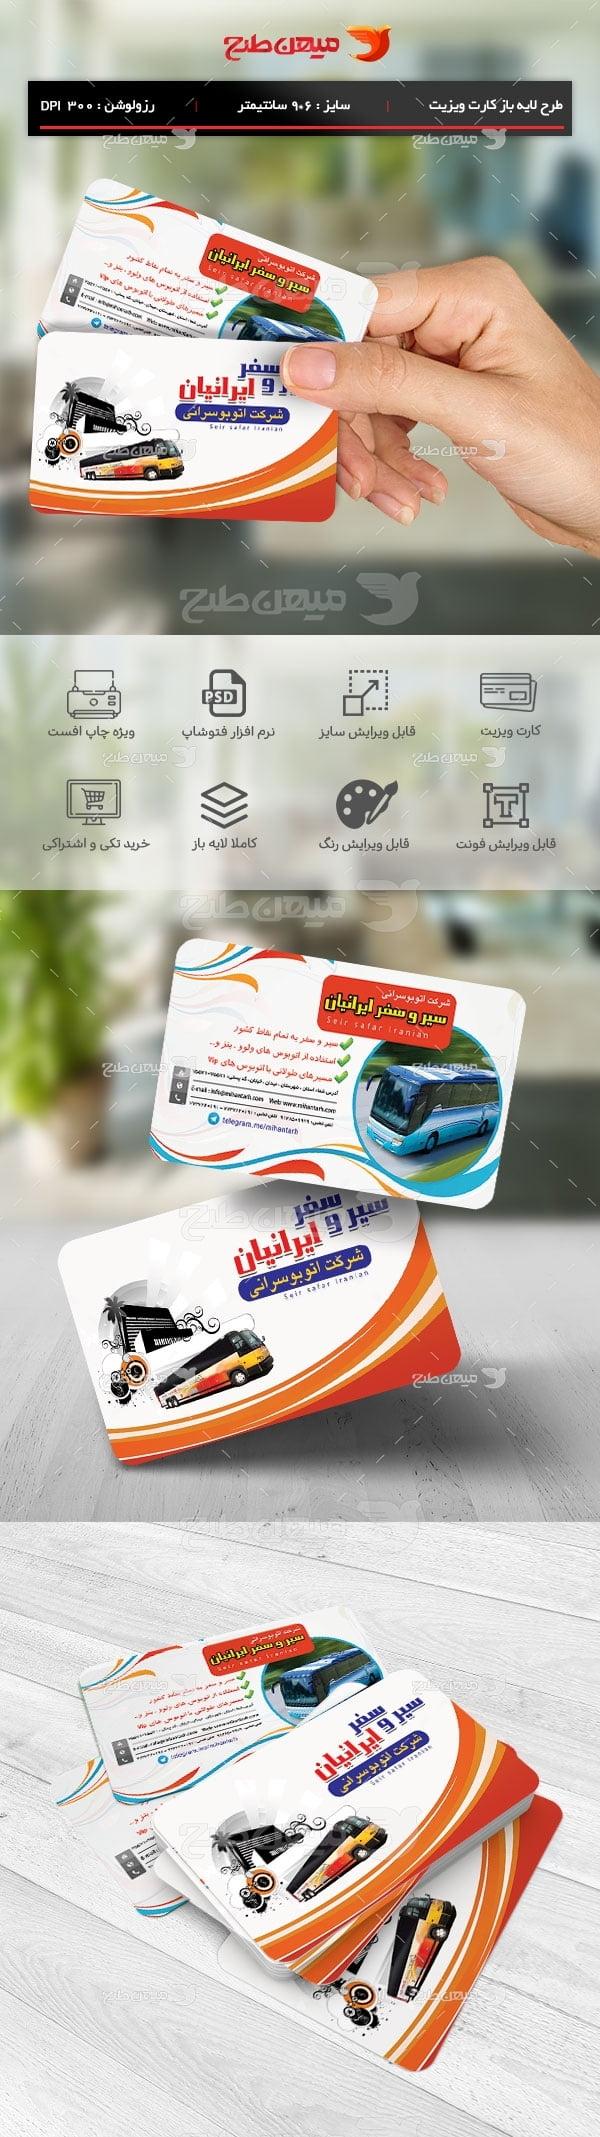 طرح کارت ویزیت شرکت اتوبوسرانی 09